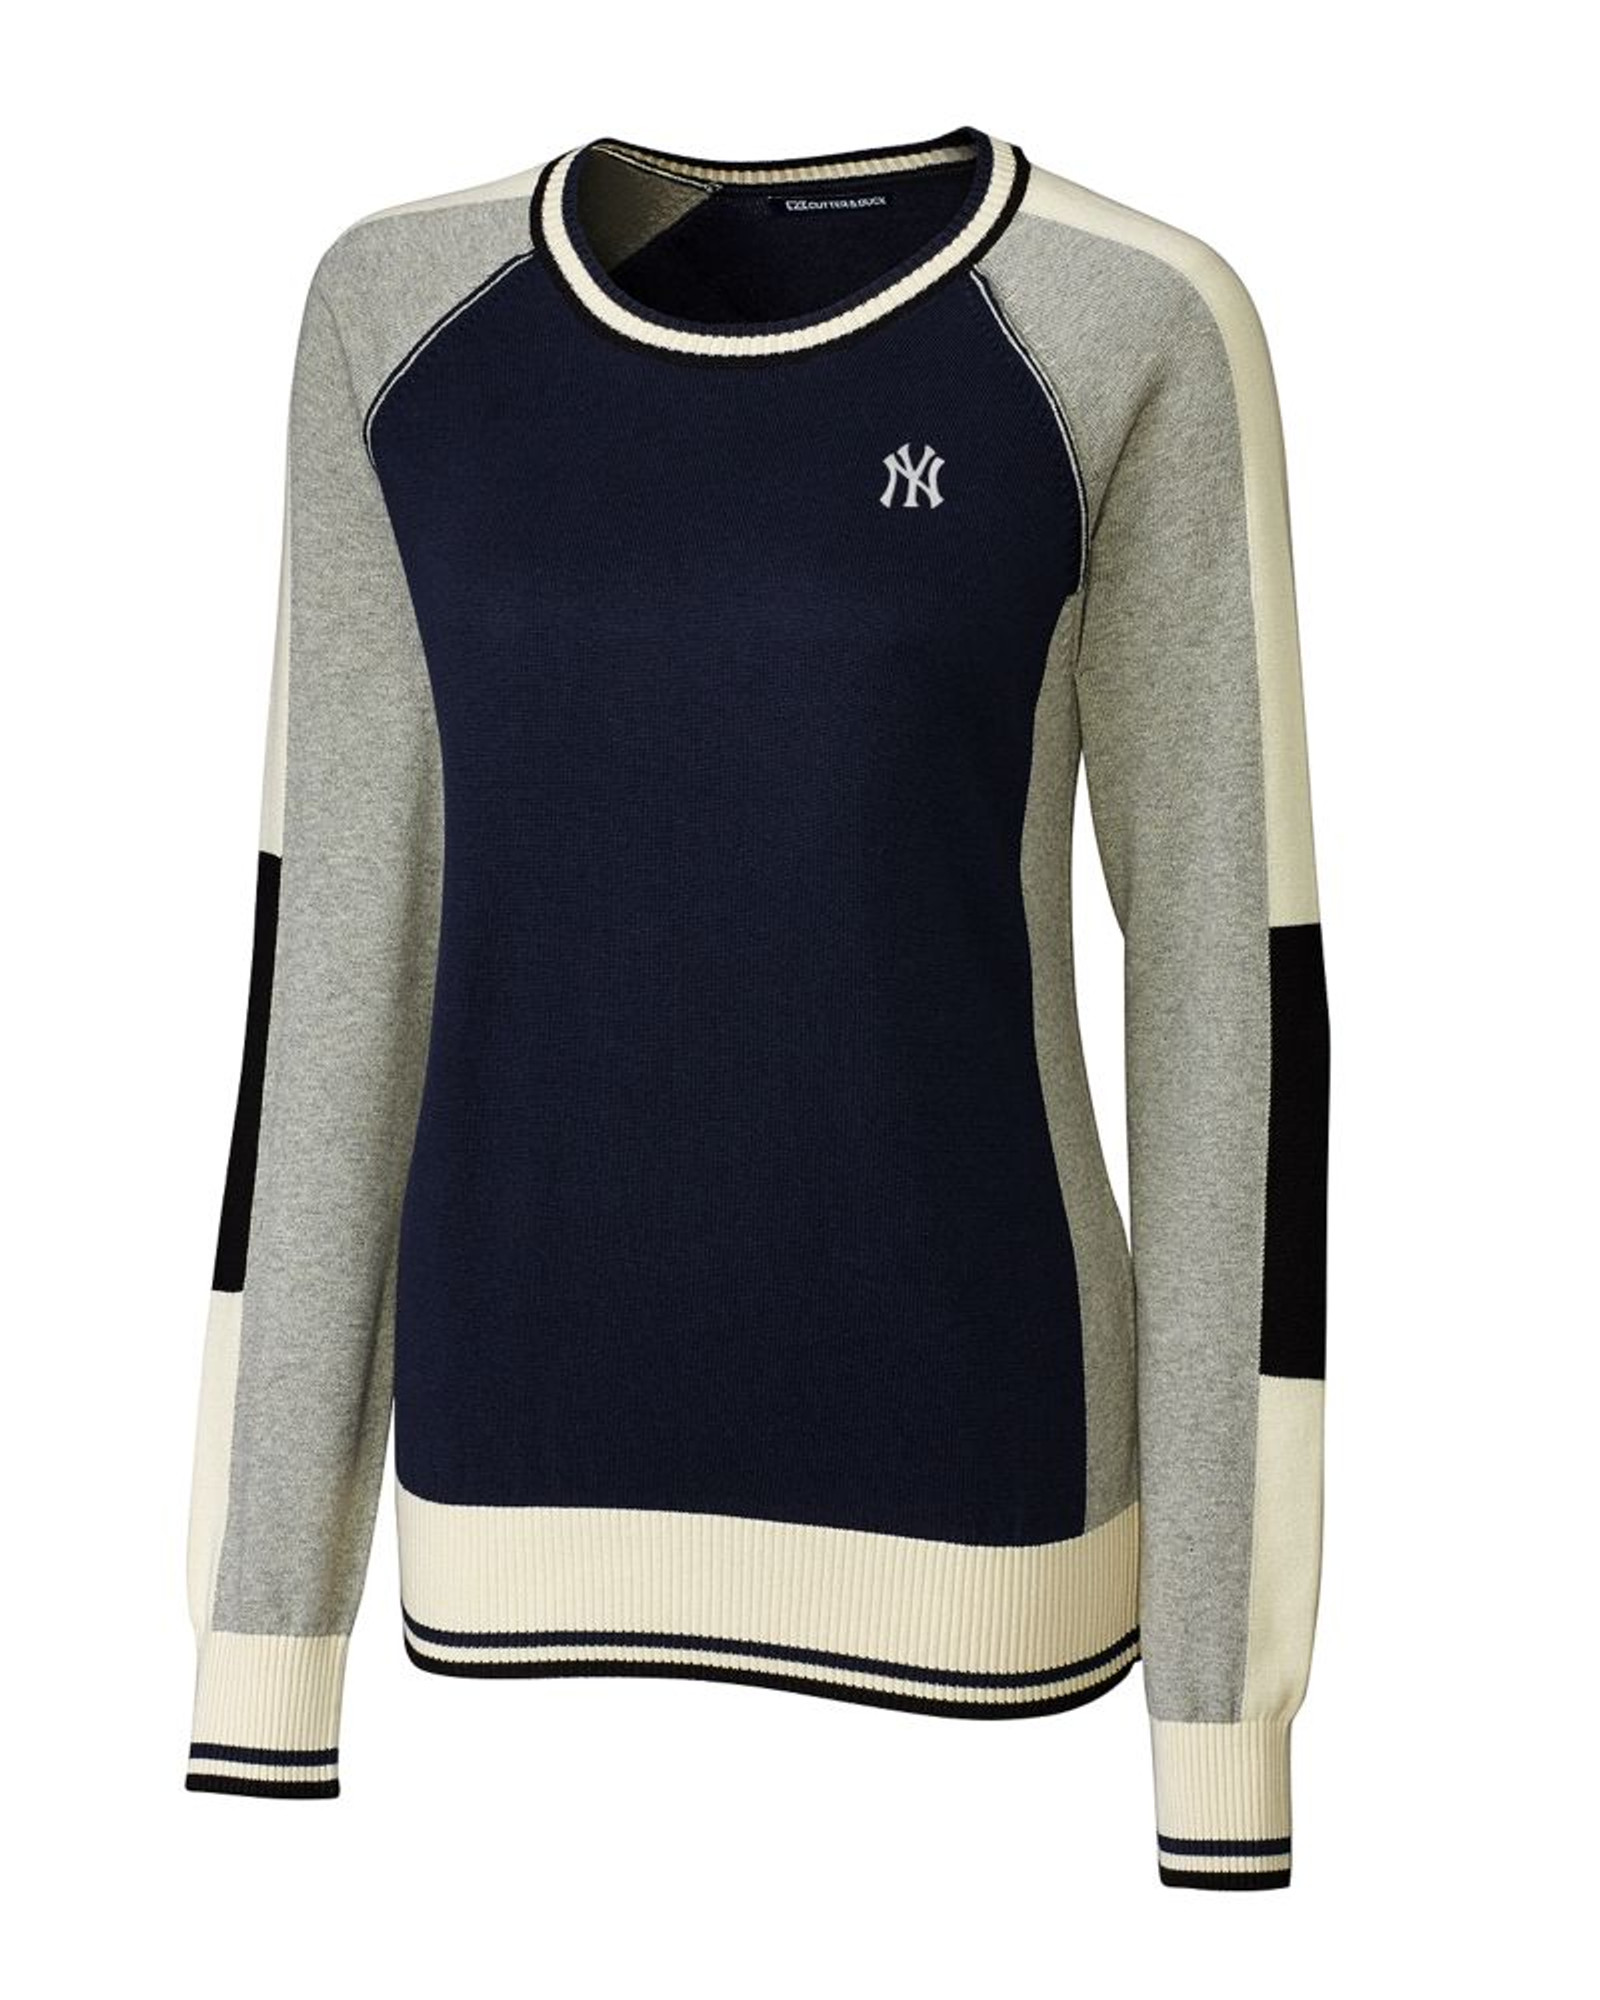 82ba0fa4 New York Yankees Ladies Stride Colorblock Sweater - Cutter & Buck